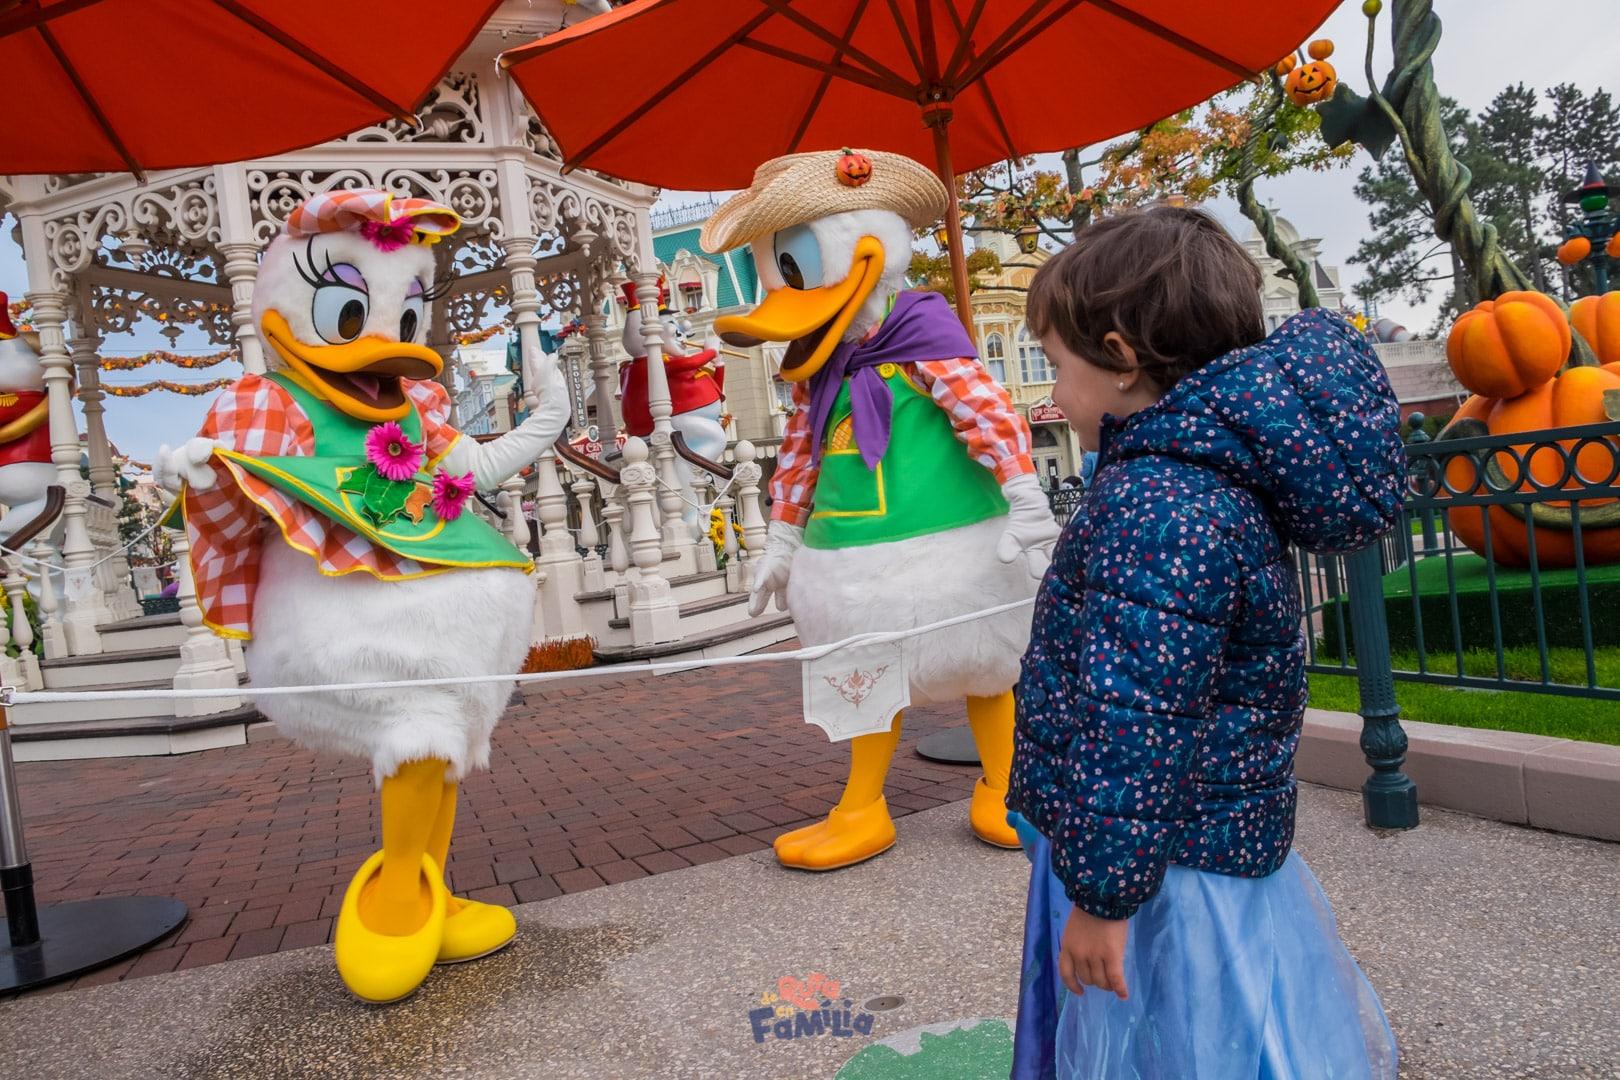 encuentros personajes Disney